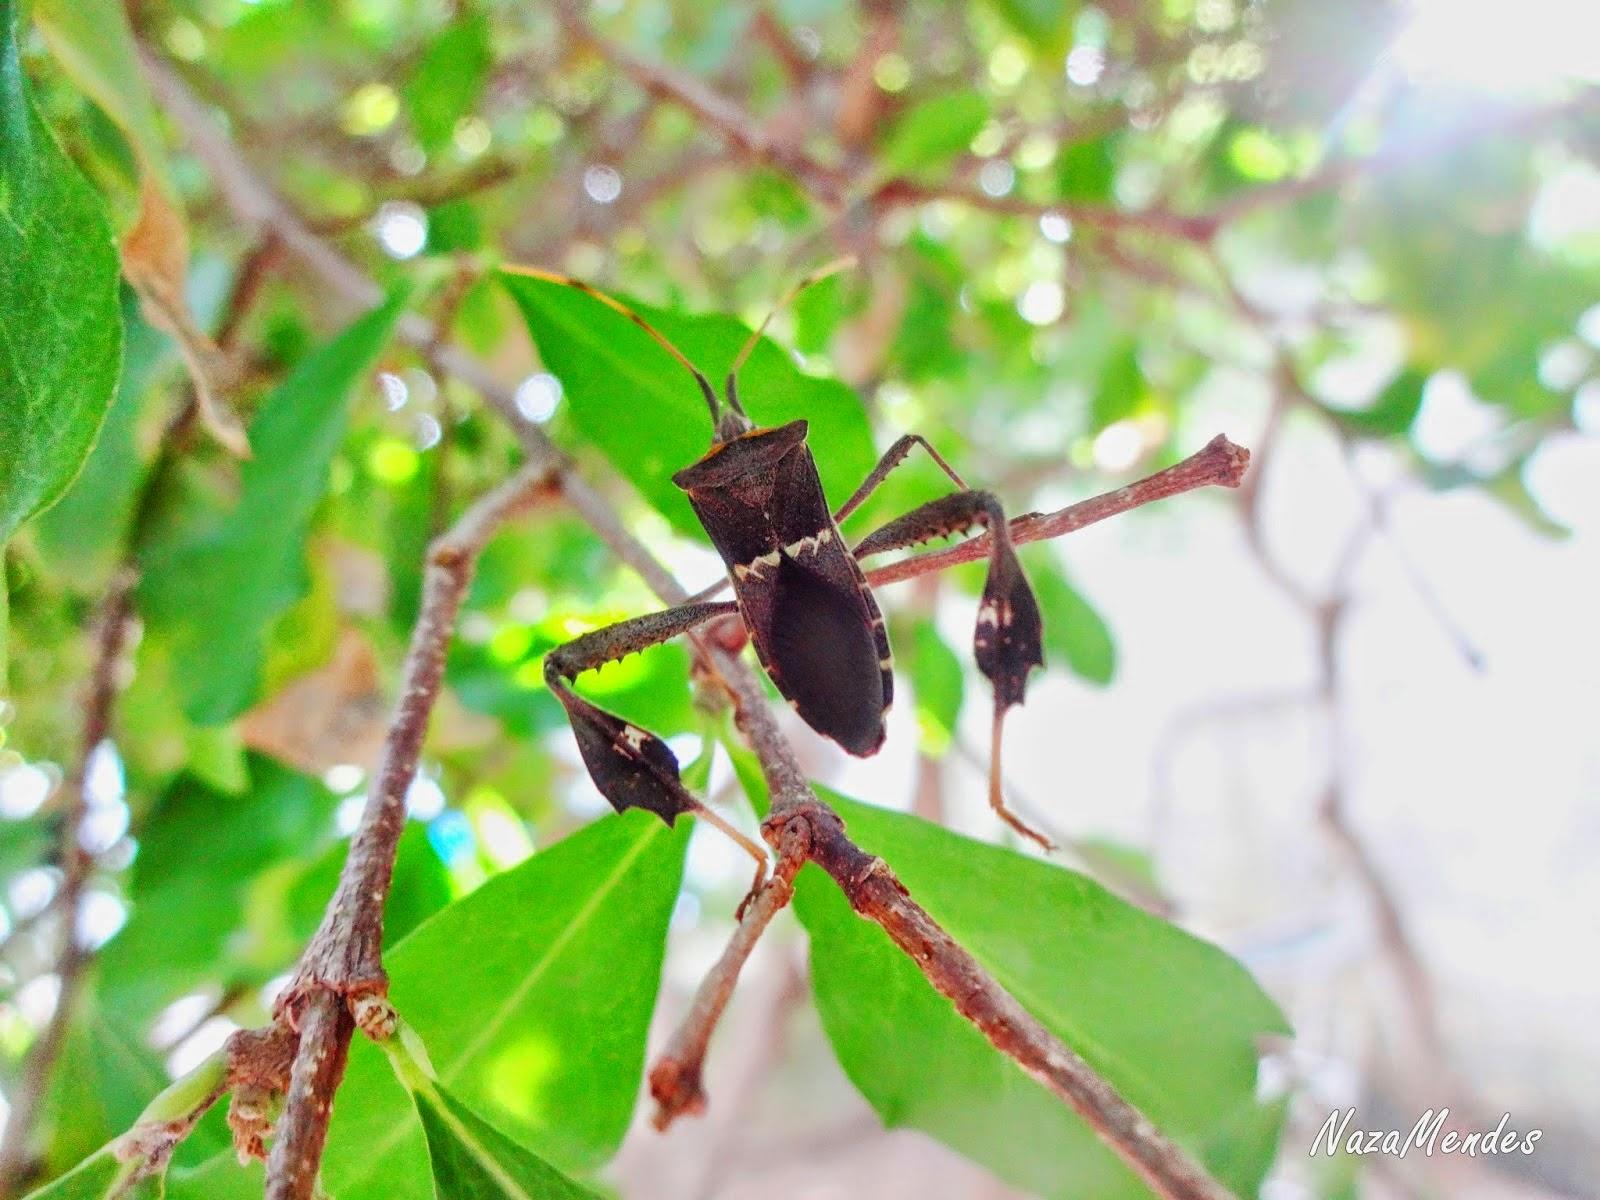 Zonatus, Leptoglossus, Coreidae, Hemiptera,